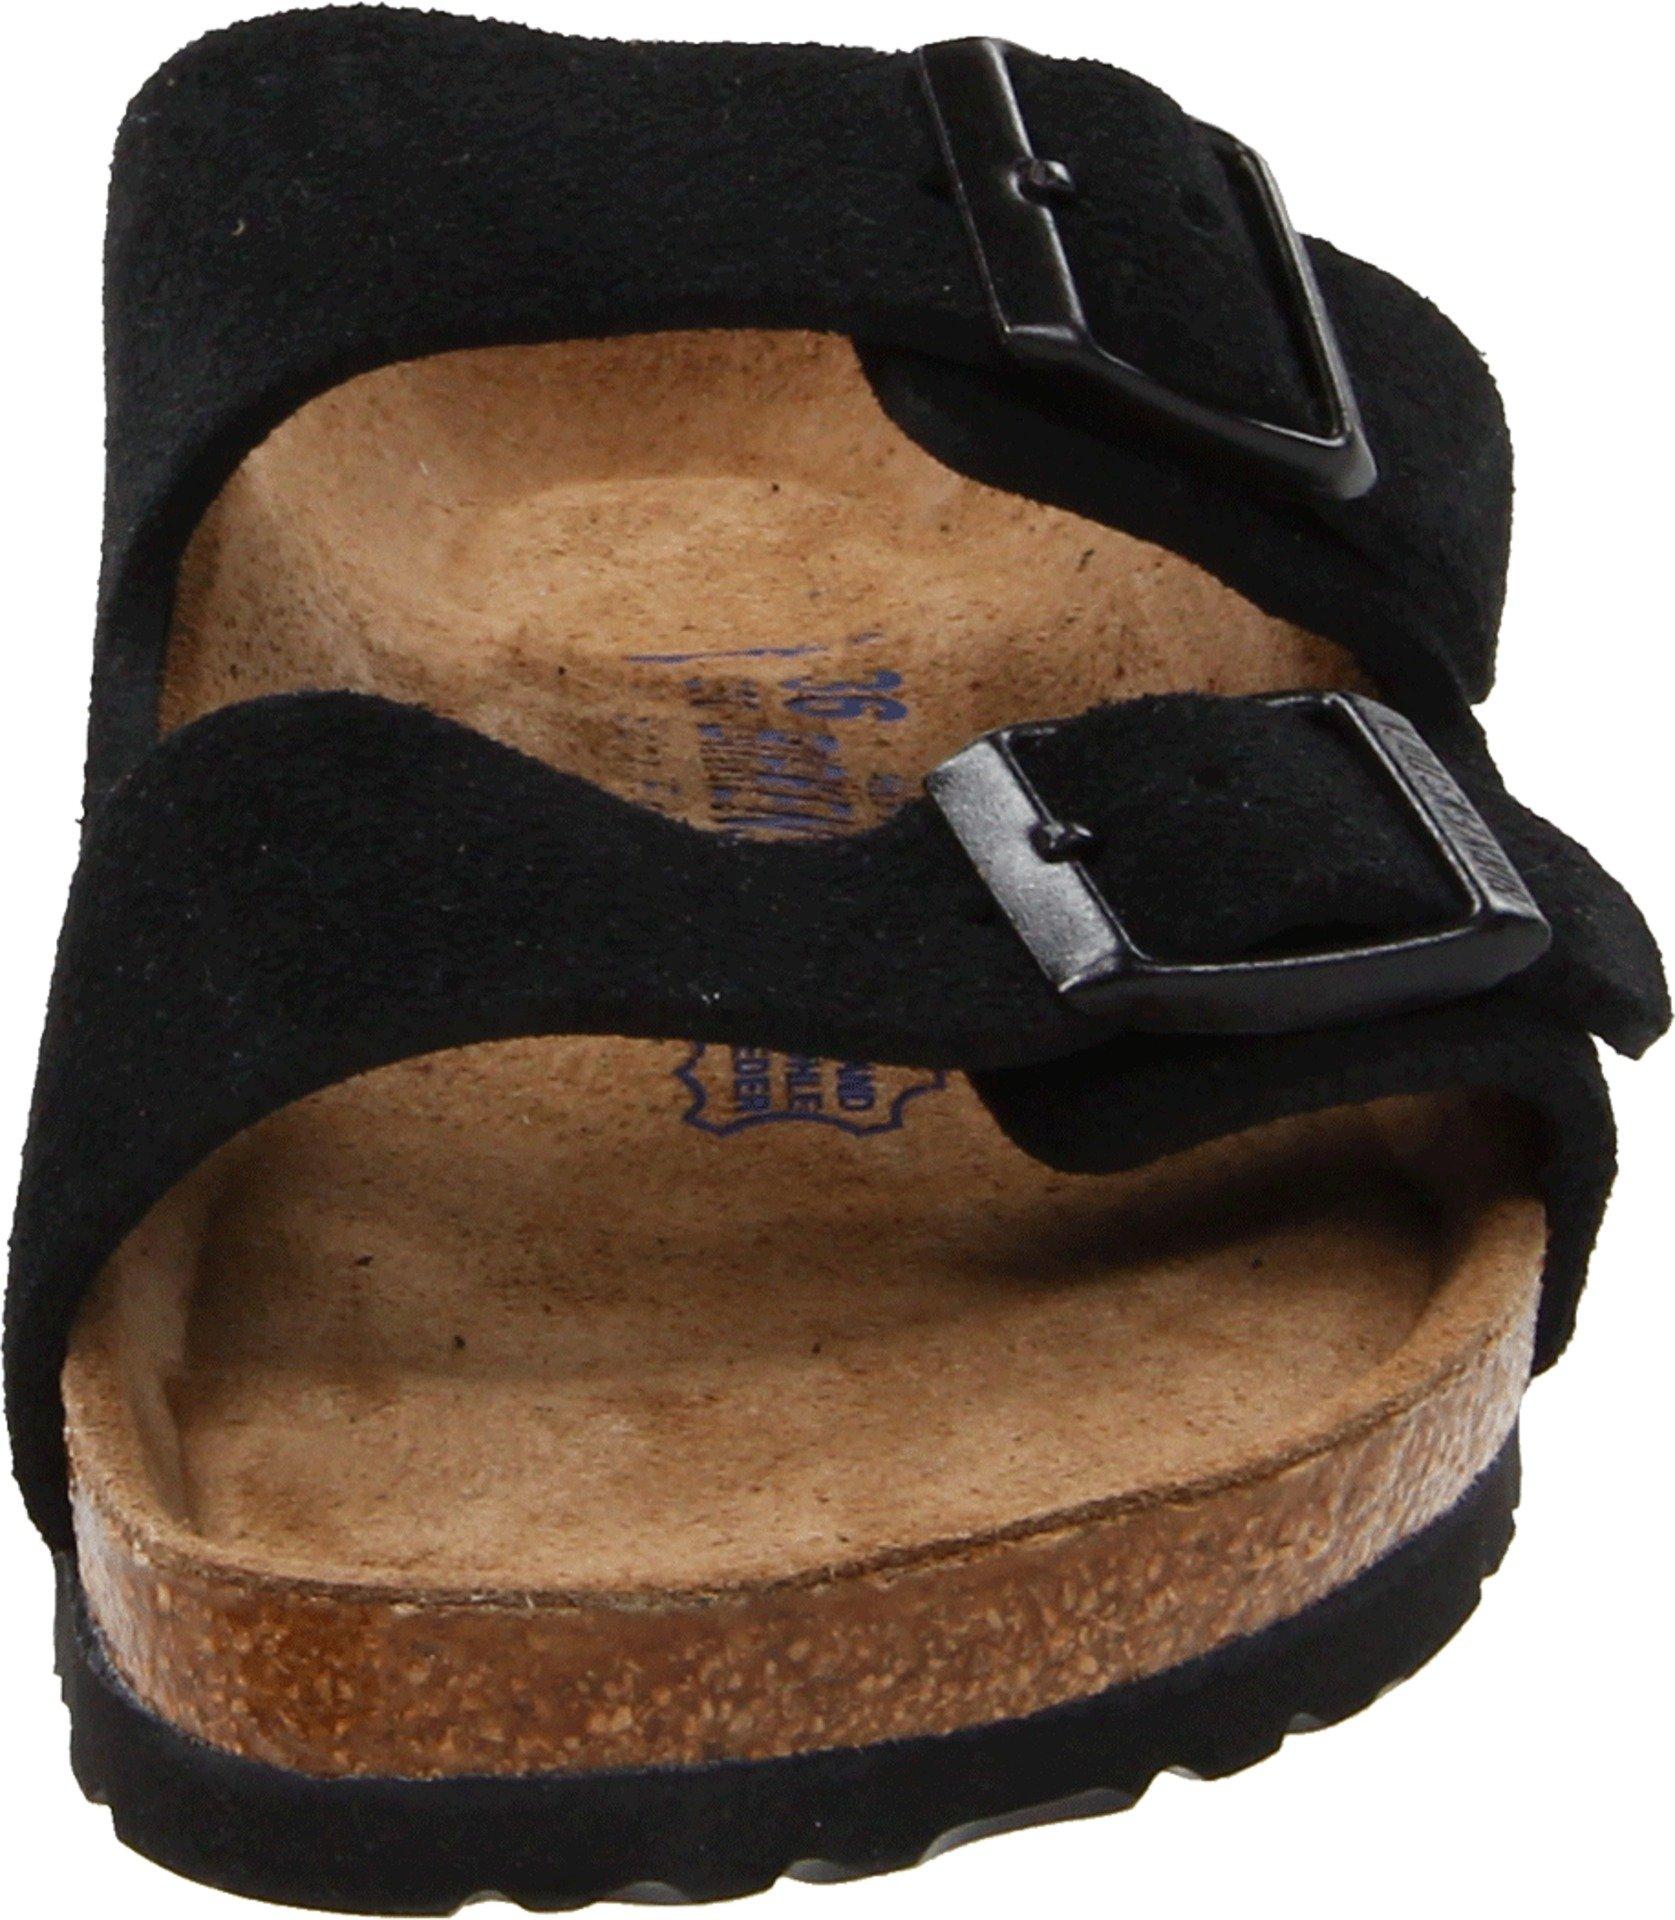 Birkenstock Arizona Soft Footbed Black Suede Regular Width - EU Size 35 / Women's US Sizes 4-4.5 by Birkenstock (Image #4)